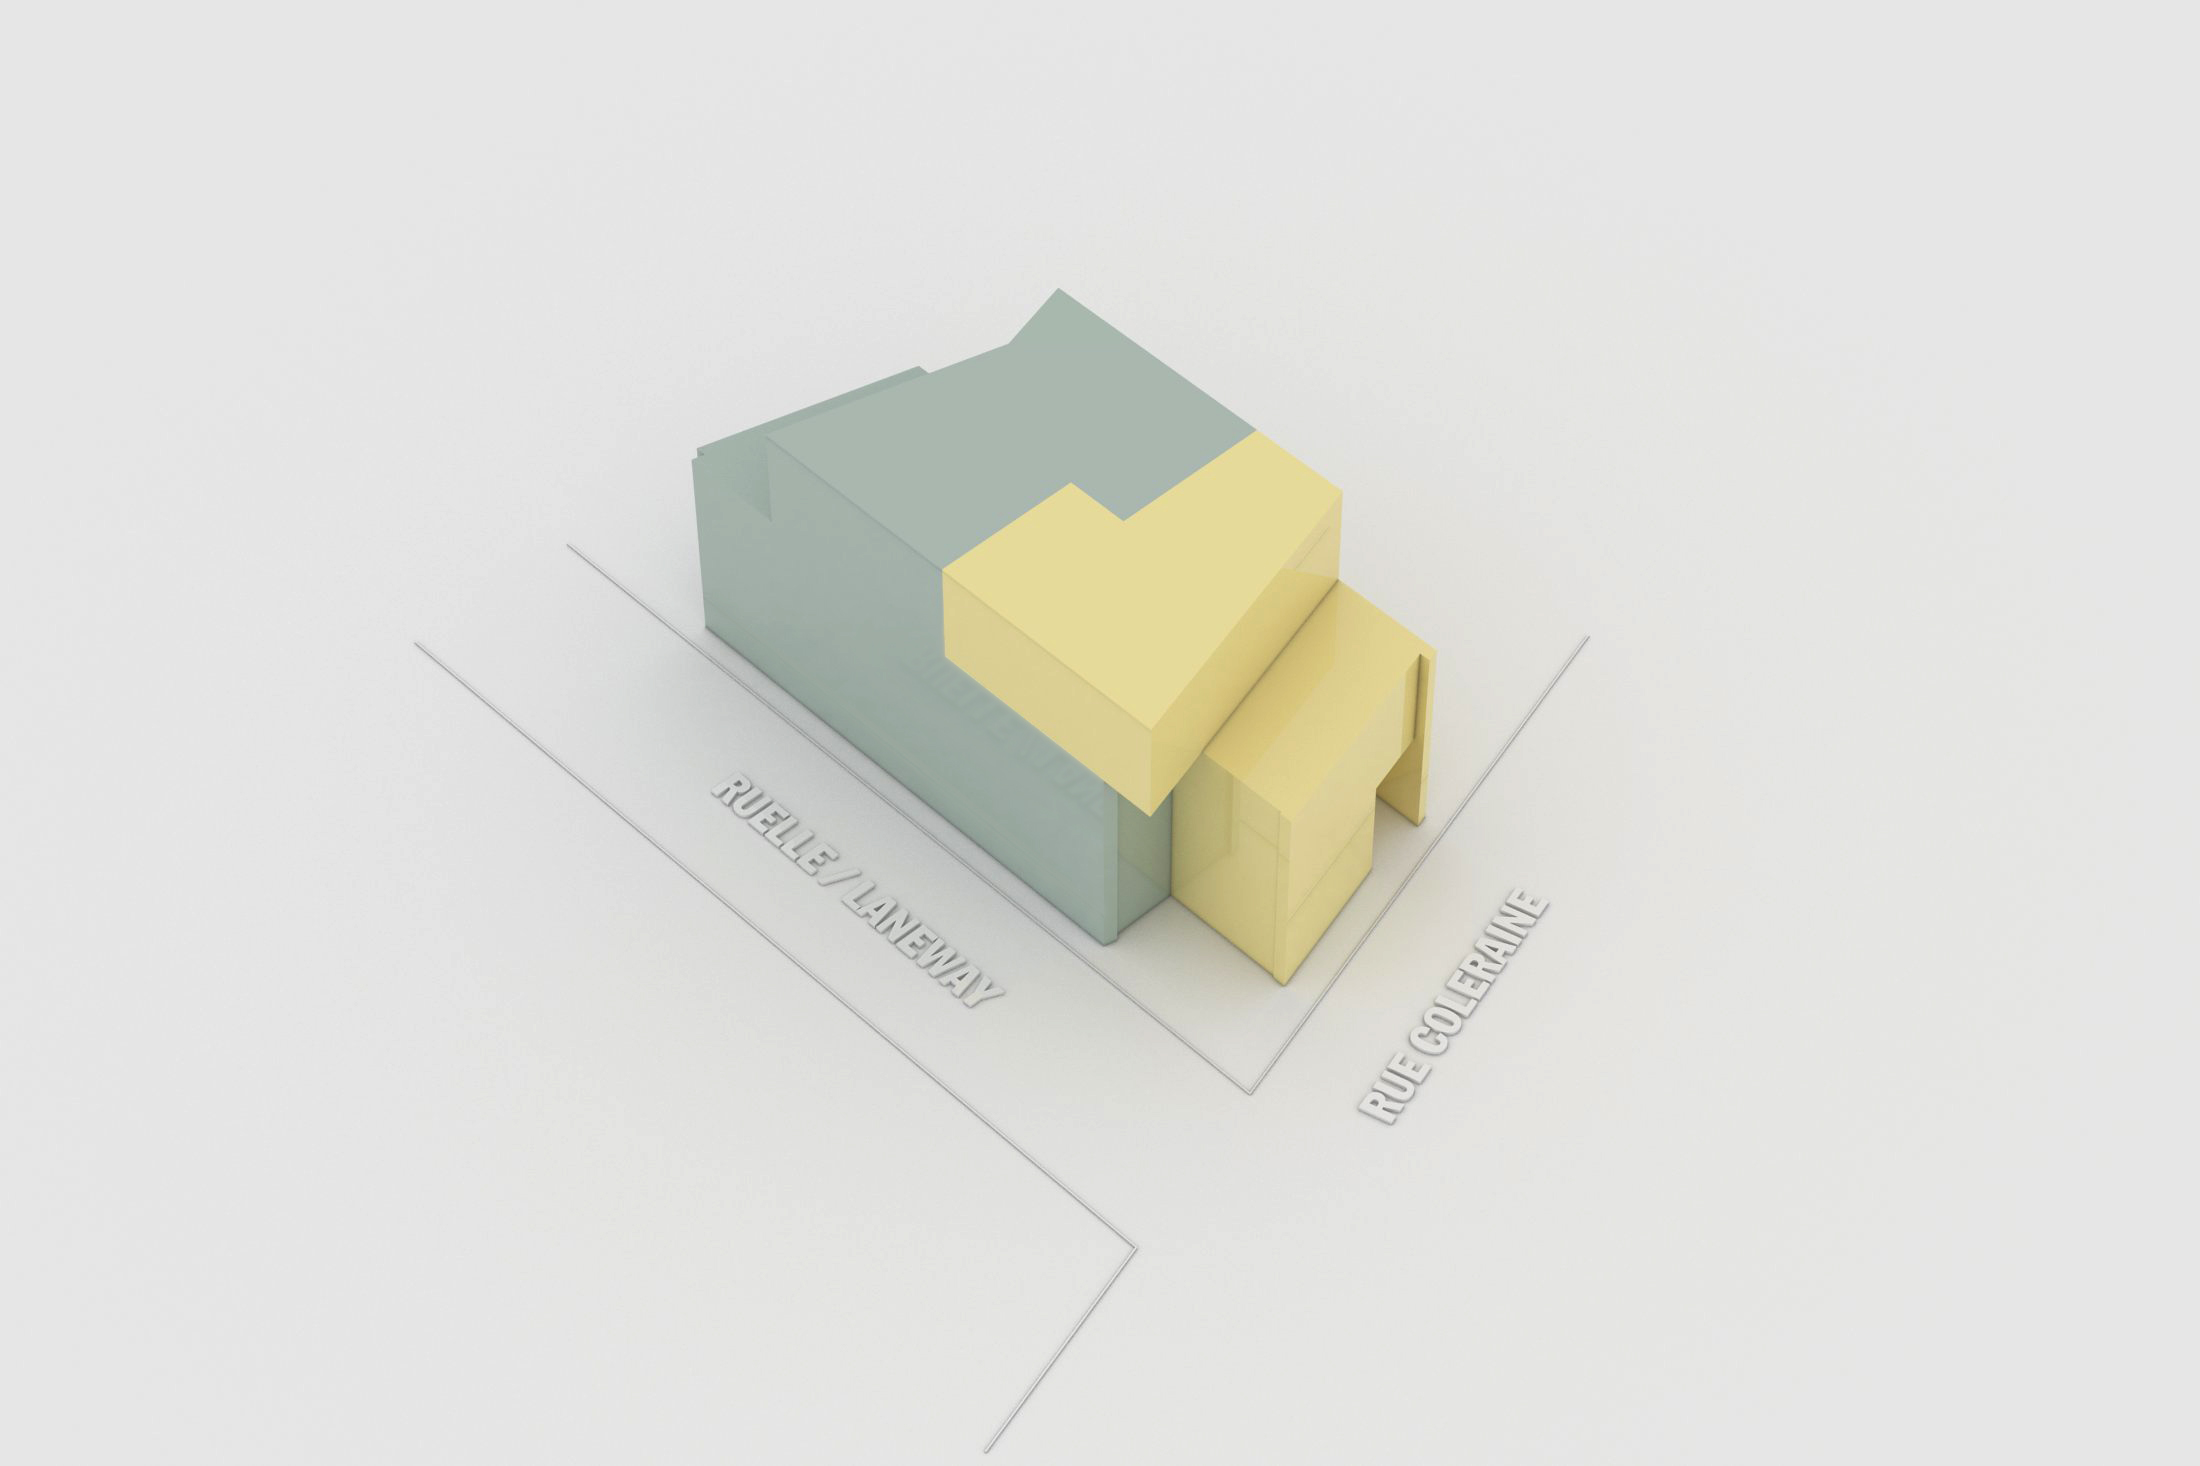 Diagrama de Casa Coleraine de NatureHumaine